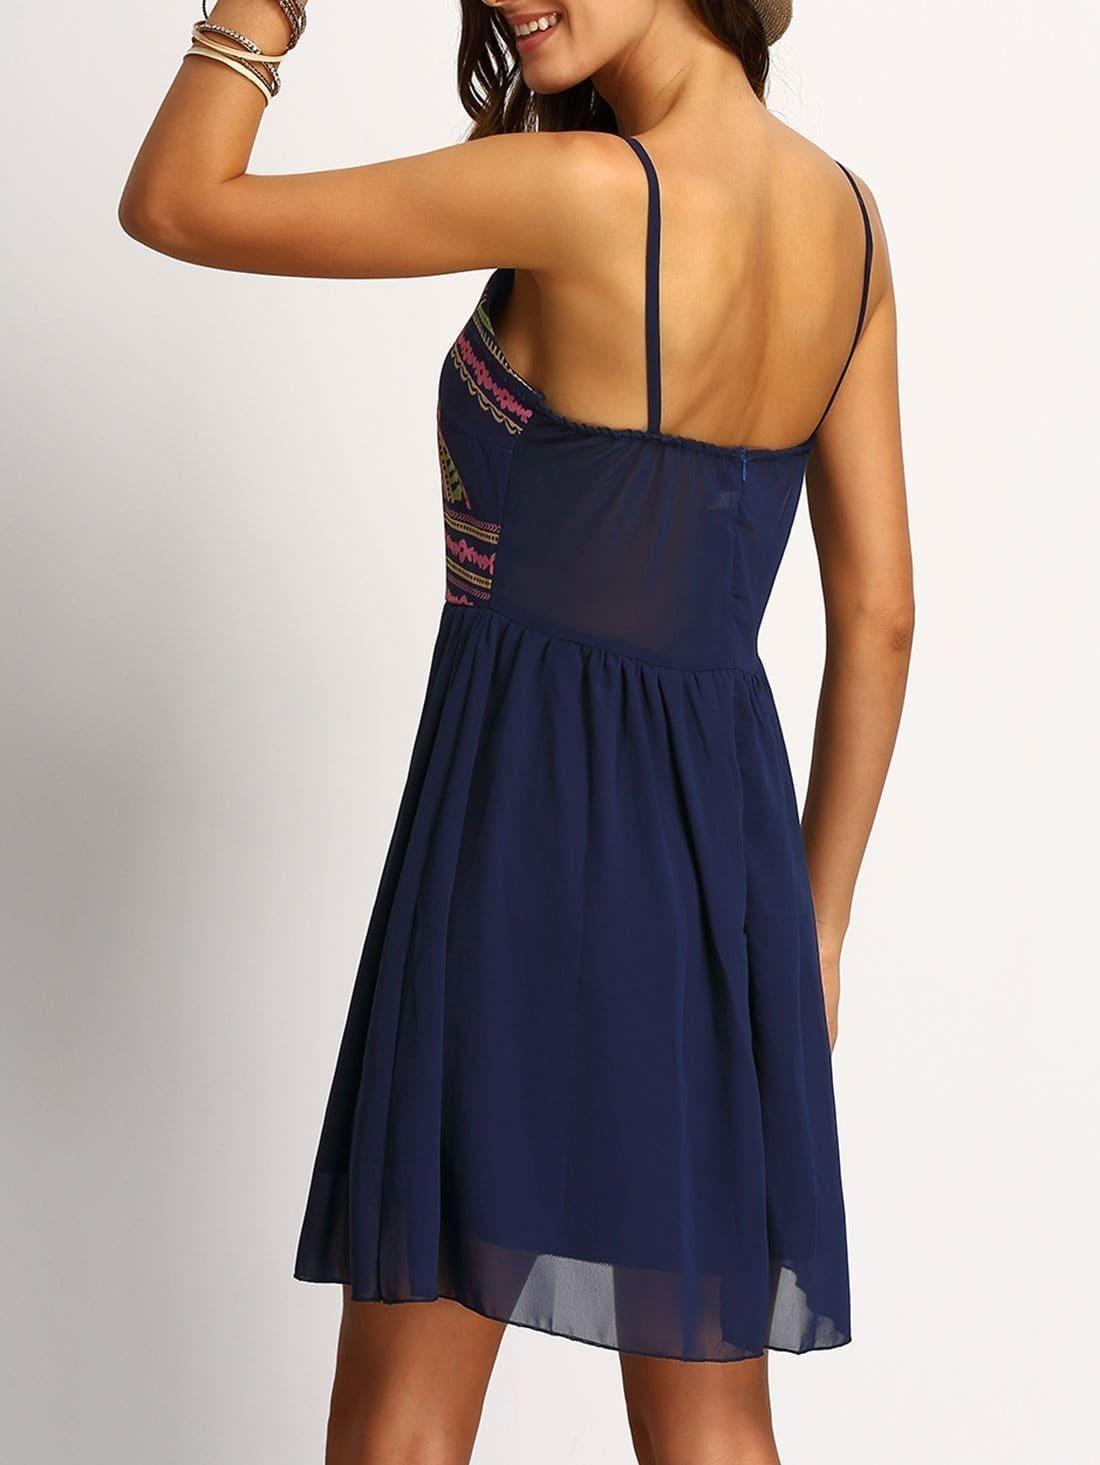 6c7e10e0b8415 Navy Spaghetti Strap Print Dress EmmaCloth-Women Fast Fashion Online